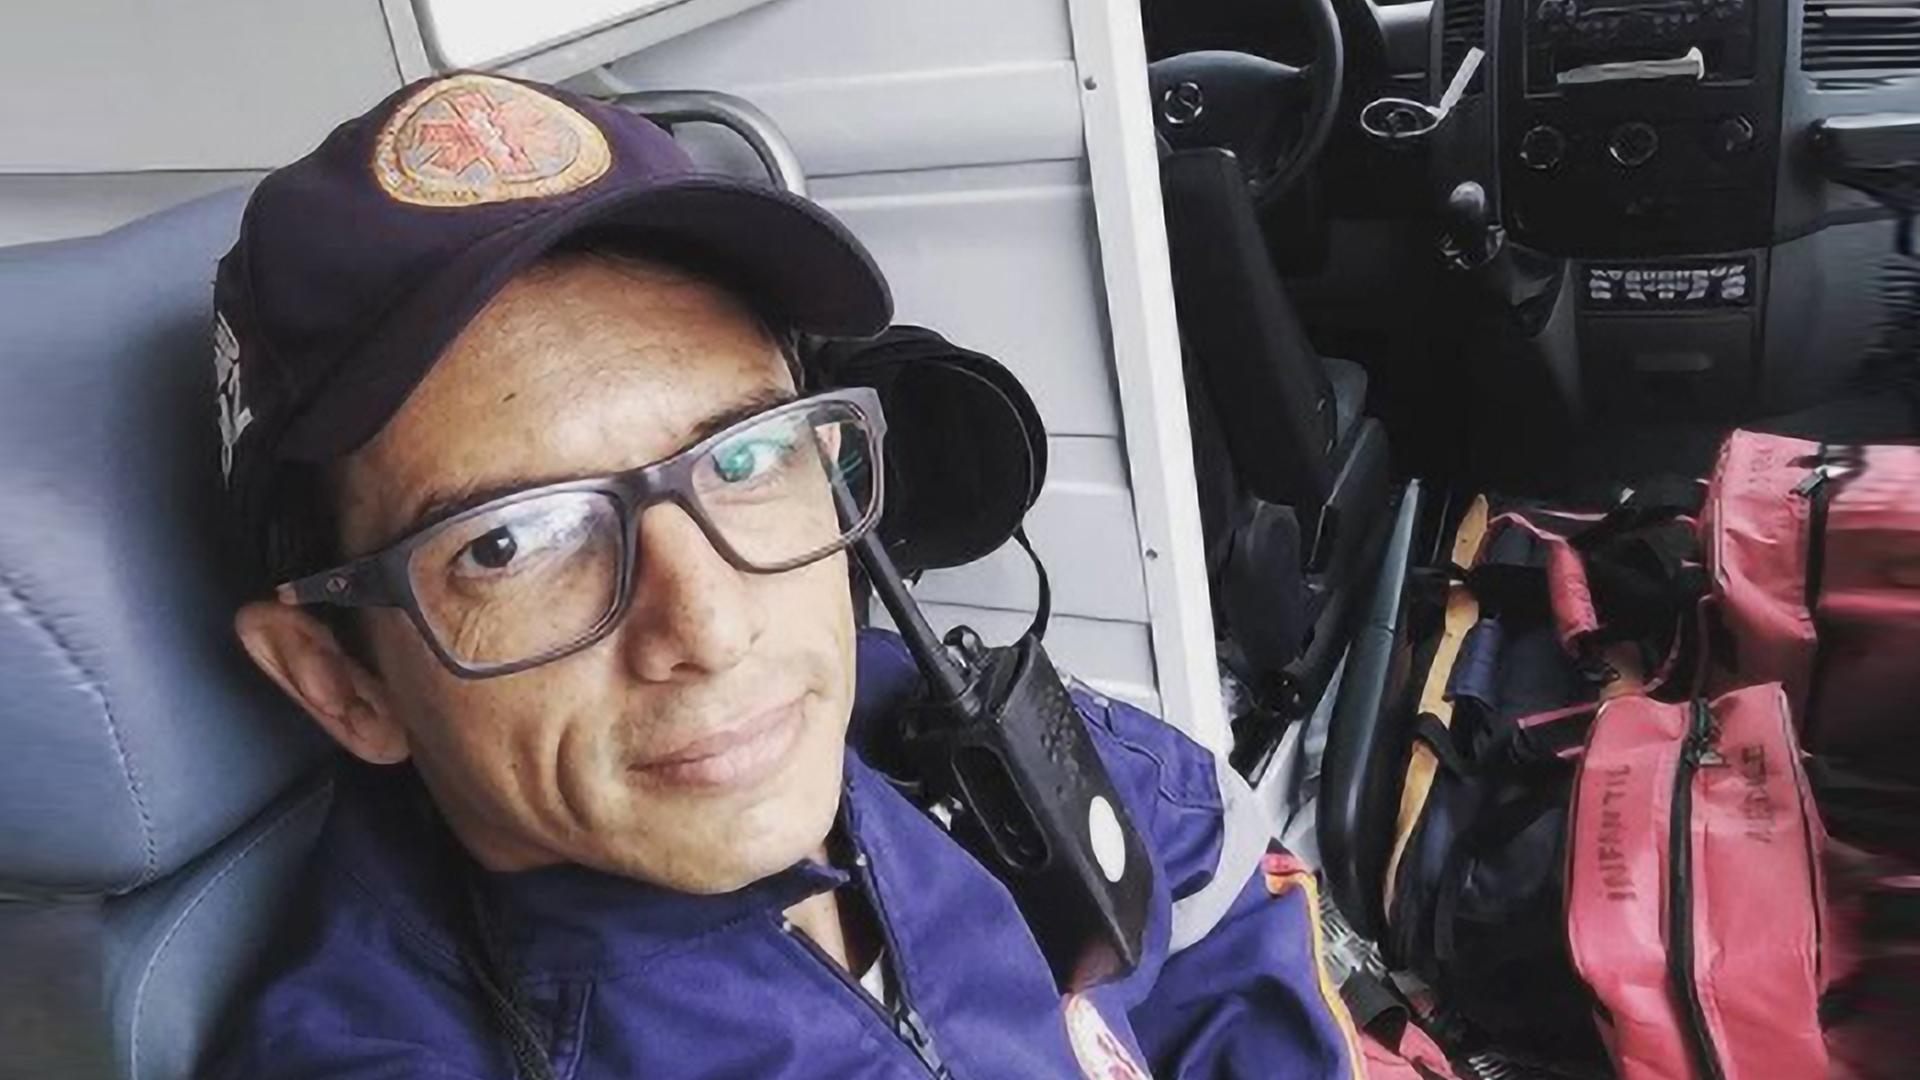 VIDEO: First-Aid Responder Faints Getting Covid Jab